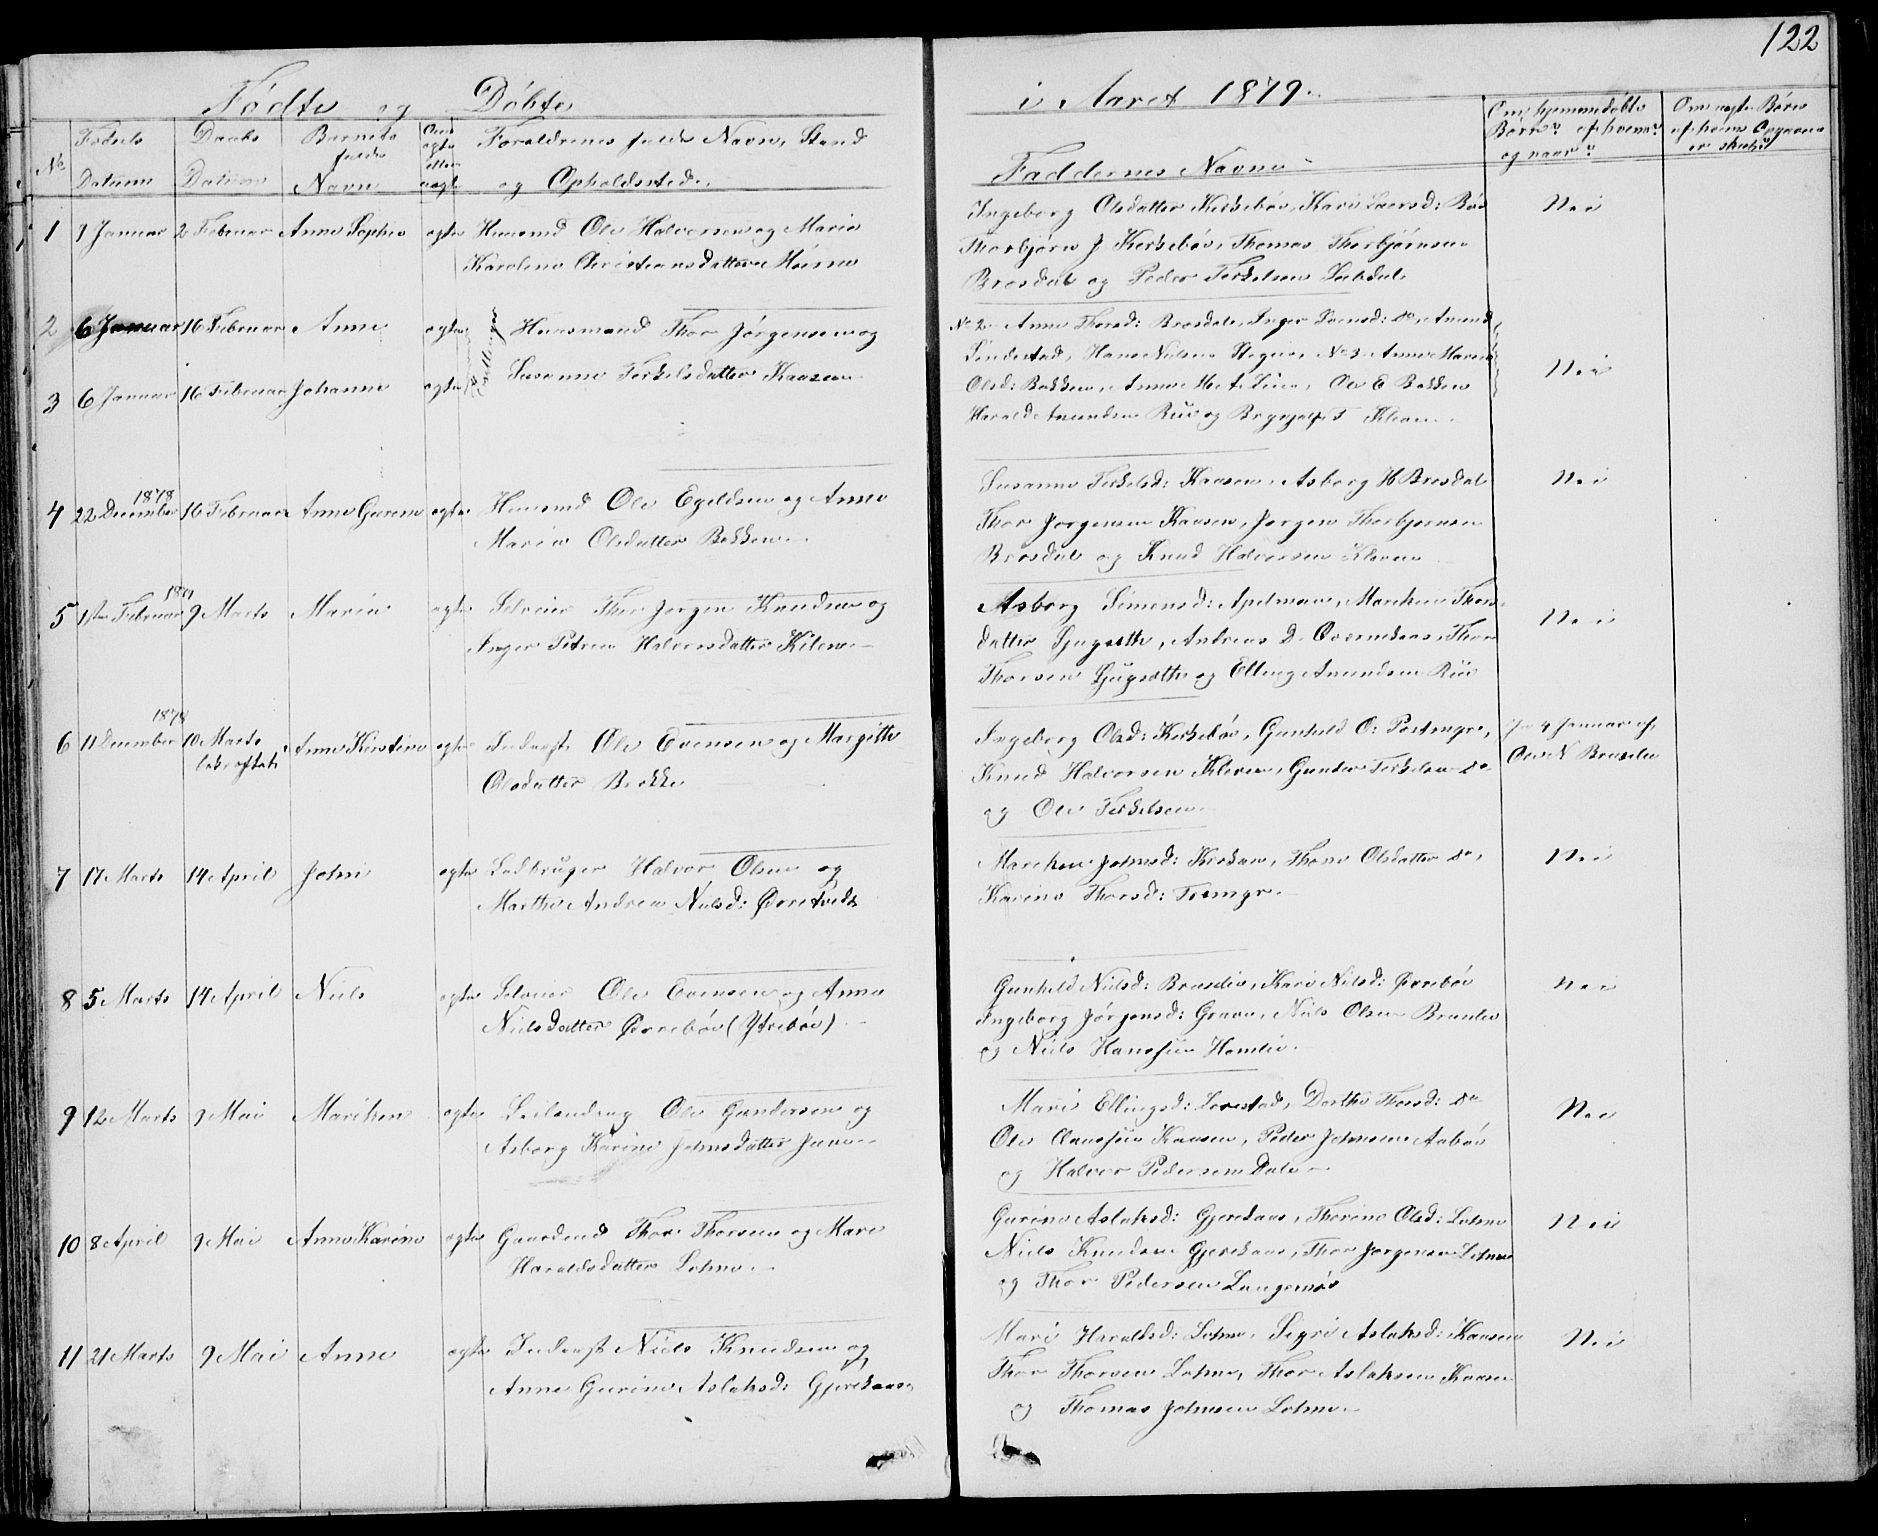 SAKO, Drangedal kirkebøker, G/Gb/L0001: Klokkerbok nr. II 1, 1856-1894, s. 122